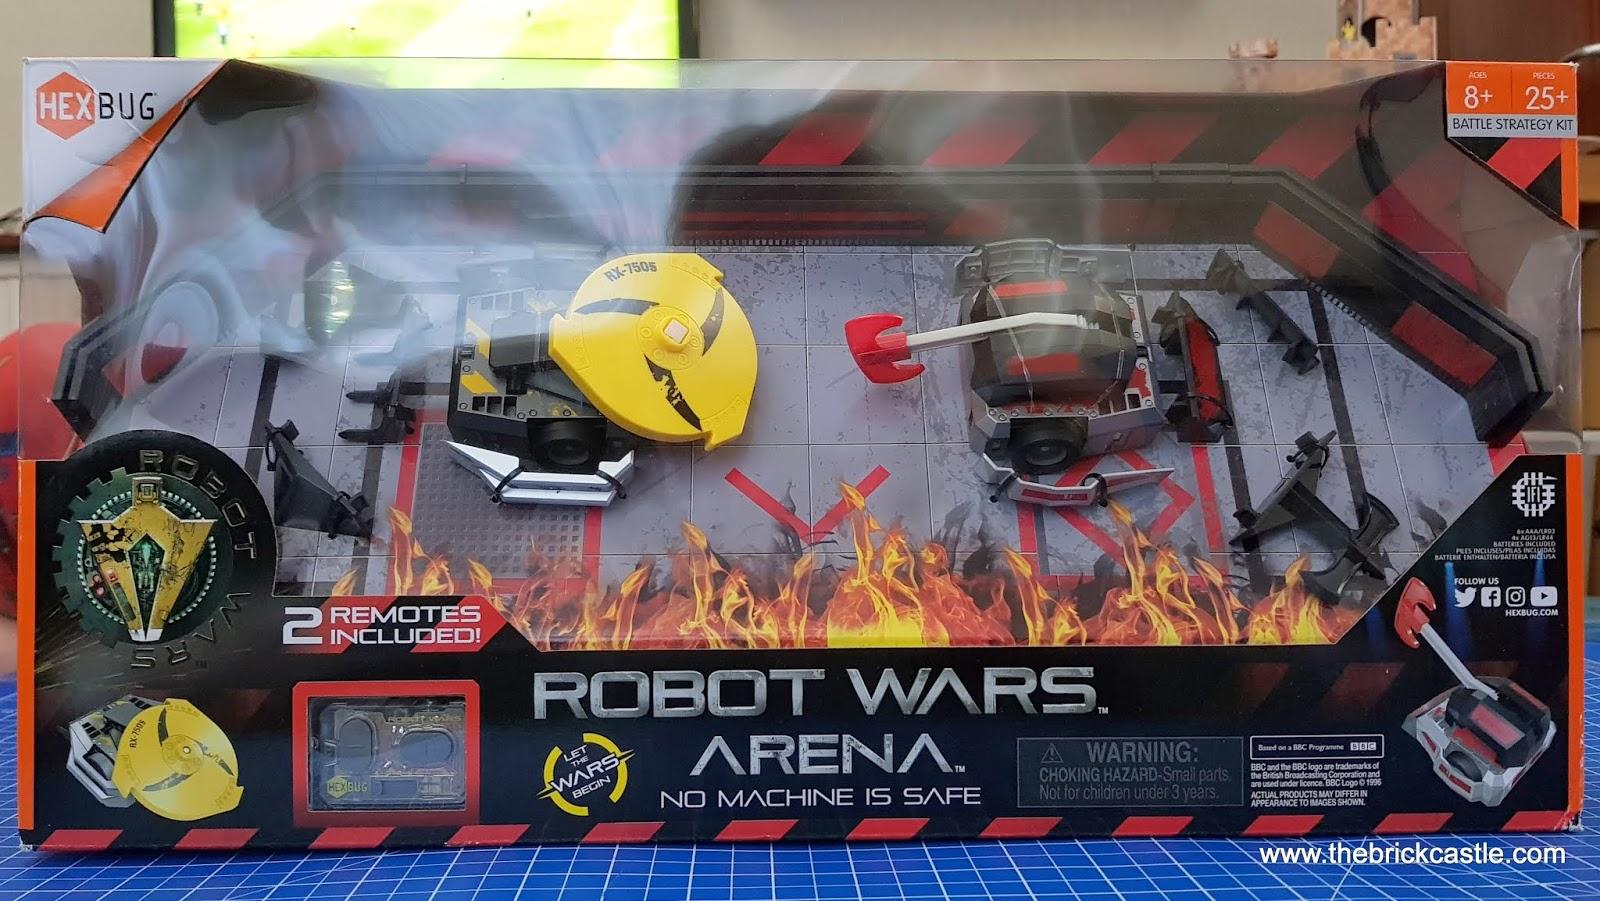 Hexbug Robot Wars Robot Single Pack Royal Pain